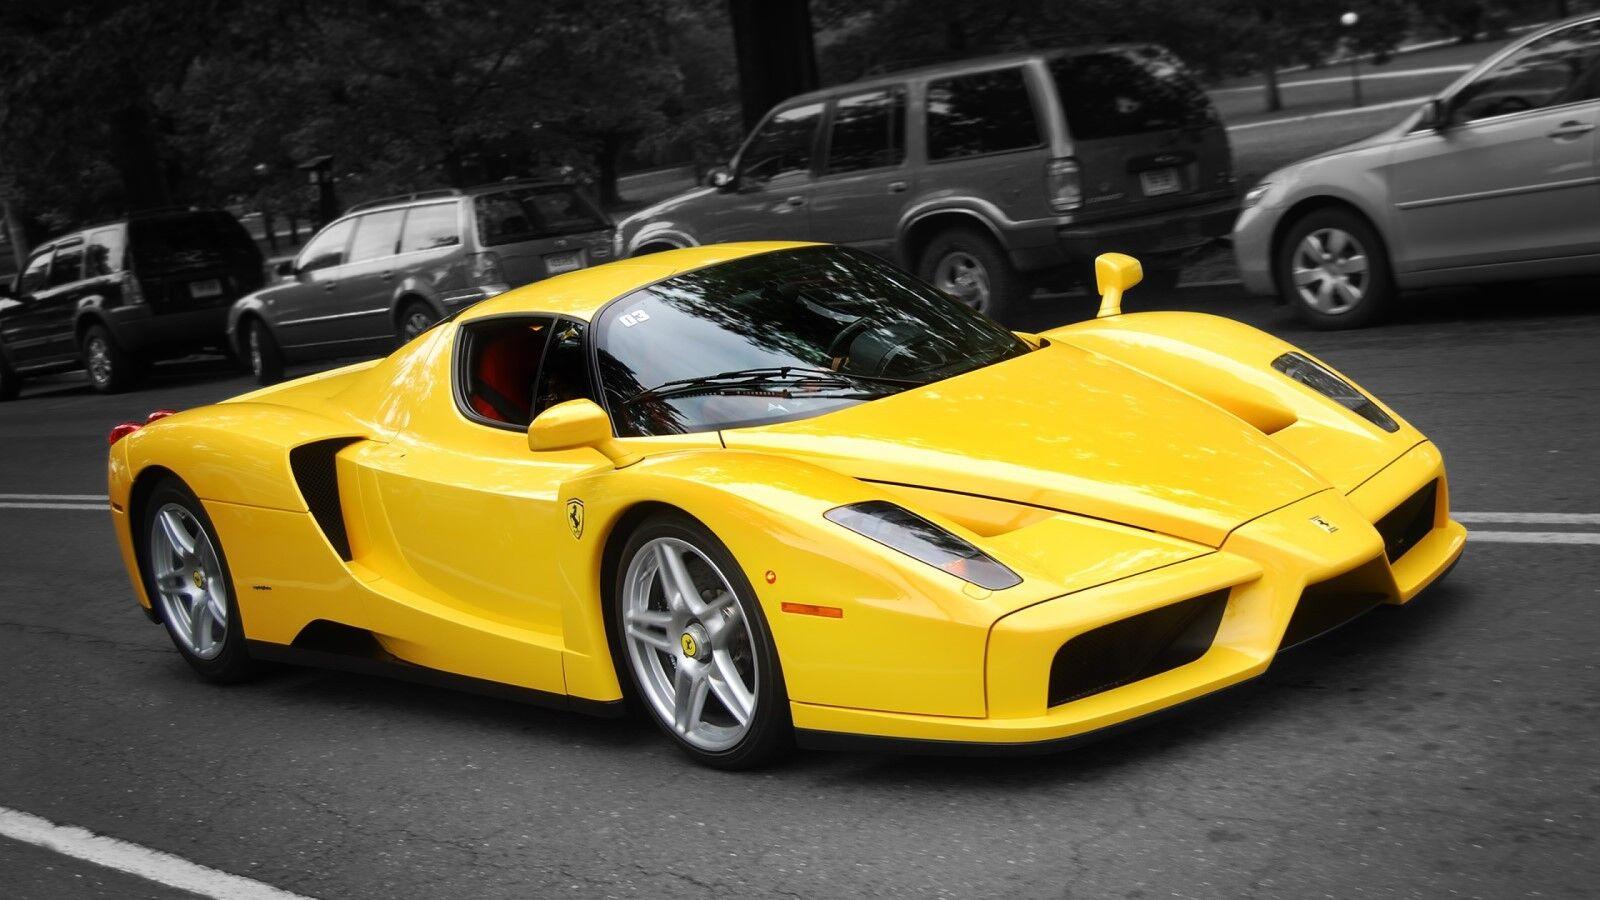 1 Ferrari F1 Racing GT Sport Race Car 12 Exotic 43 Racer 24 Carousel giallo 18